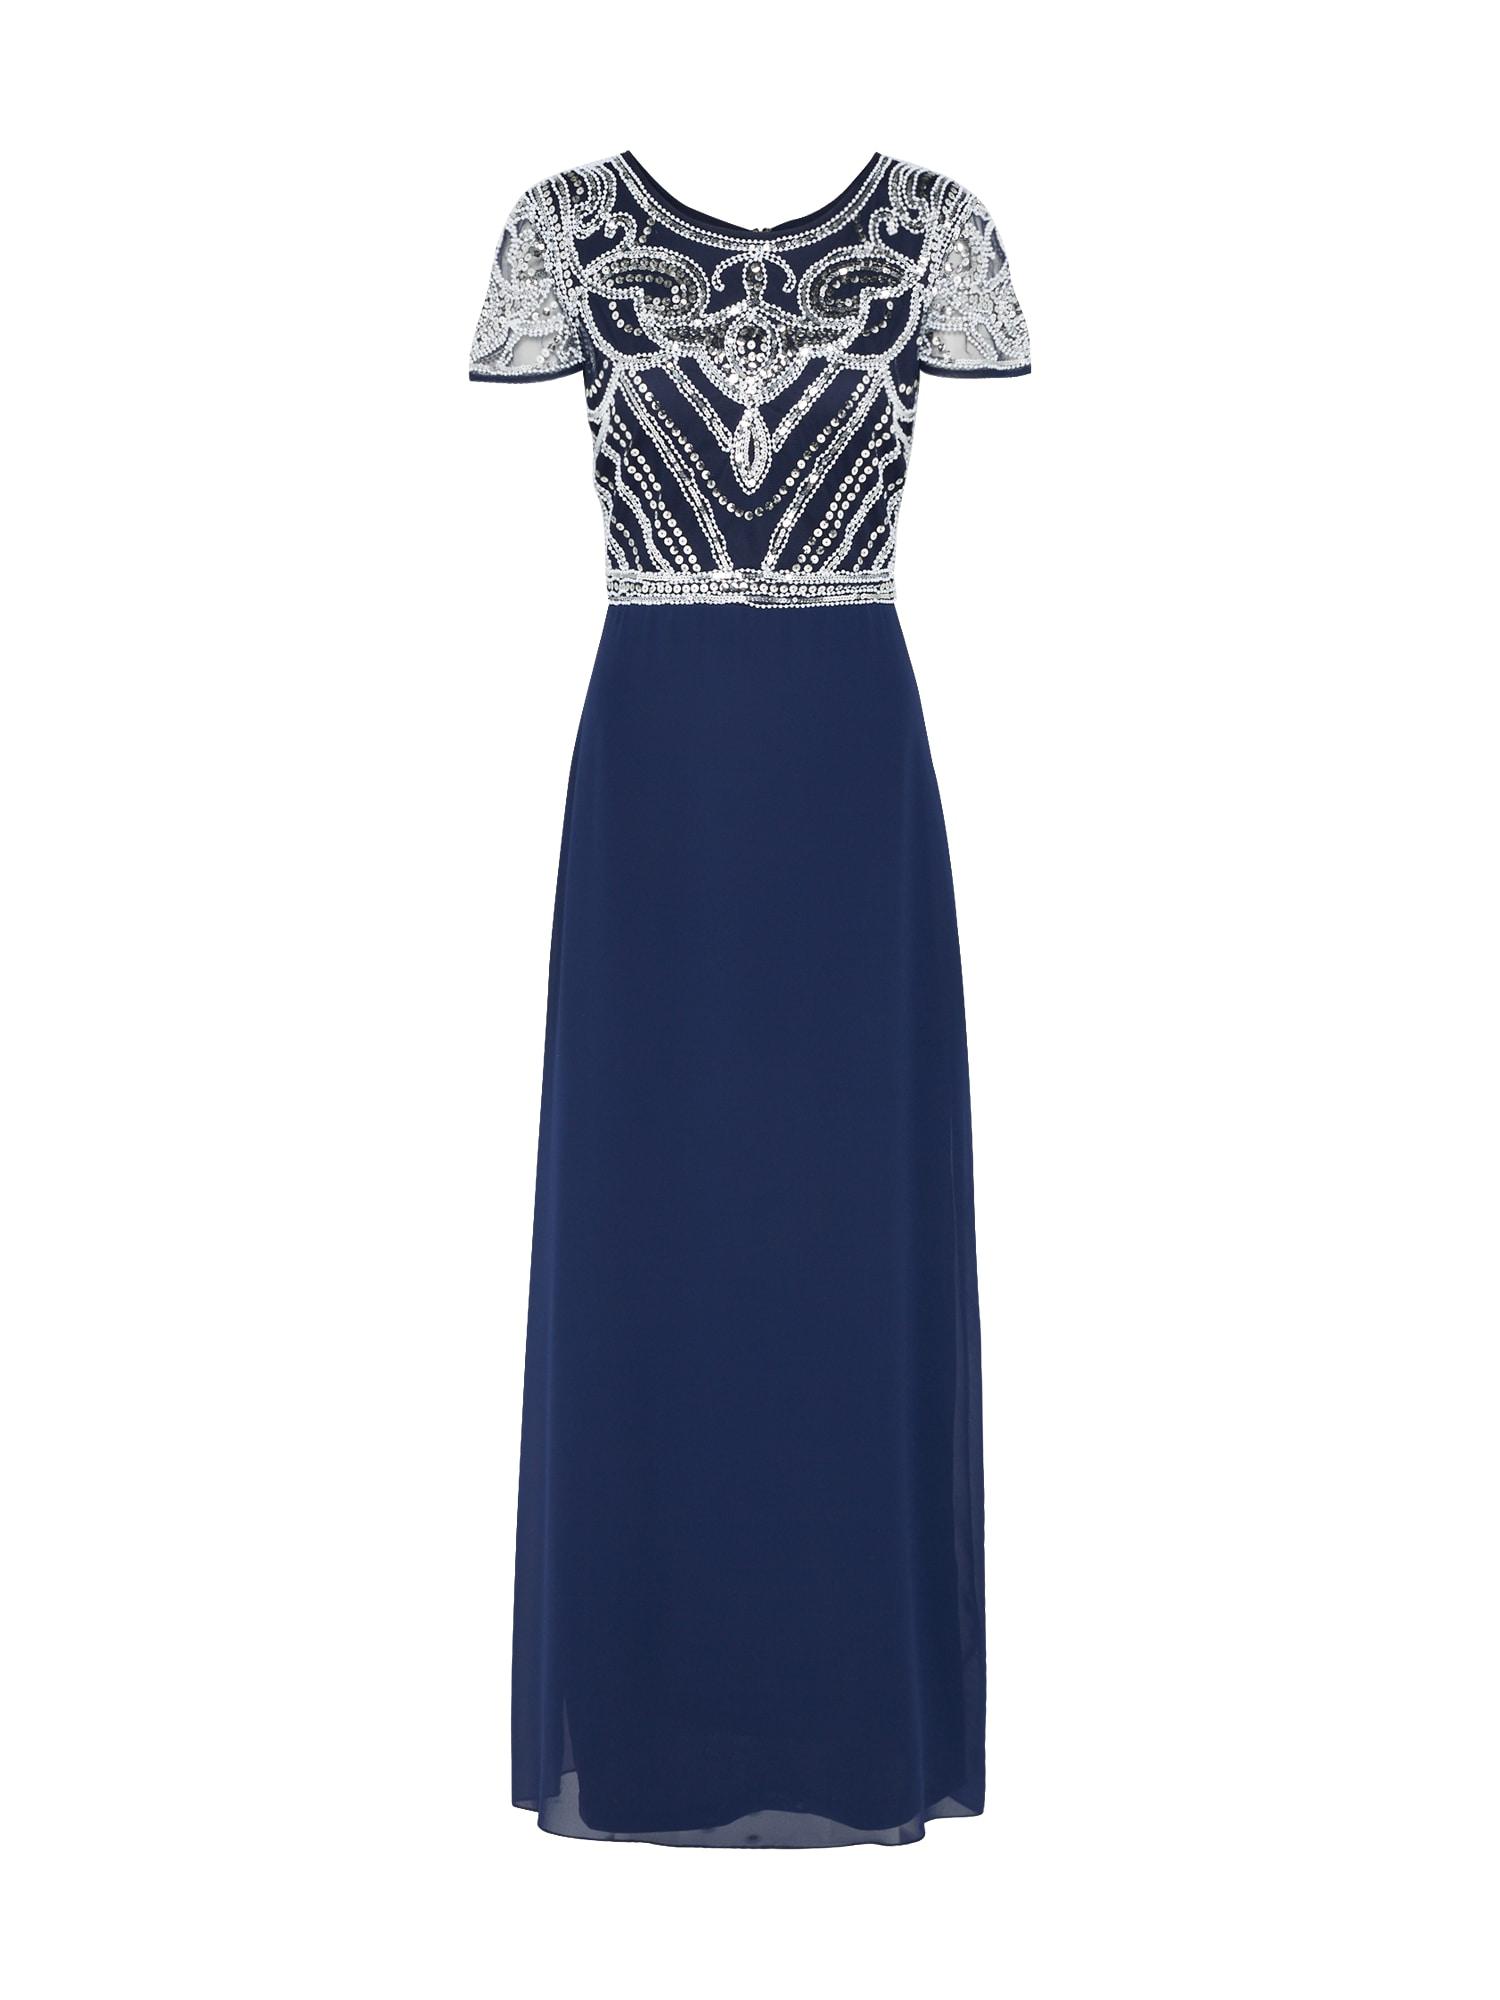 Boohoo Vakarinė suknelė 'BOUTIQUE FRANCESCA' balta / tamsiai mėlyna